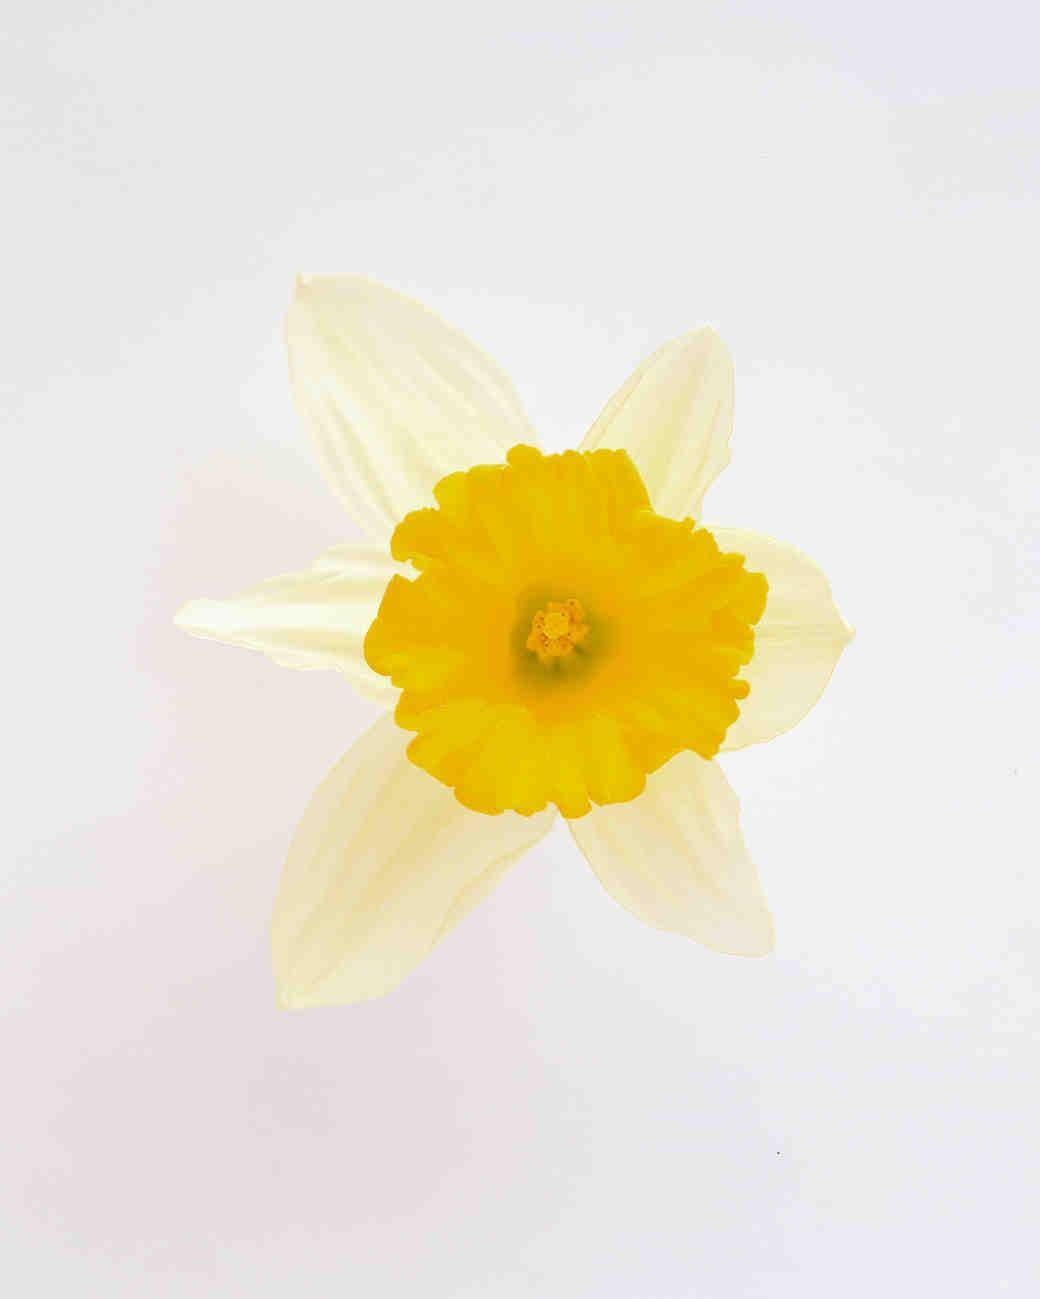 flower-glossary-daffodil-a98432-0415.jpg